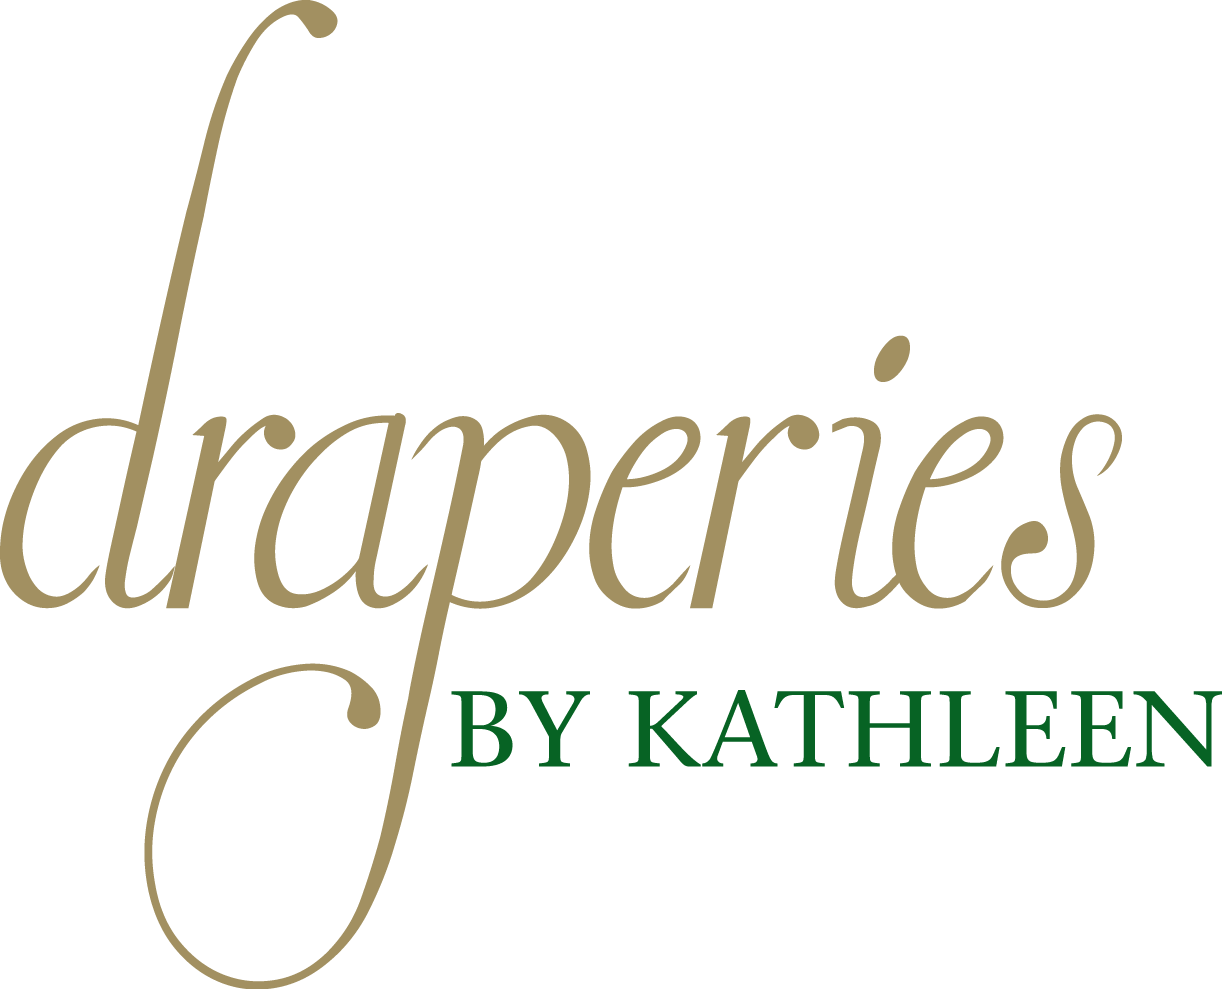 draperies.logo.2c